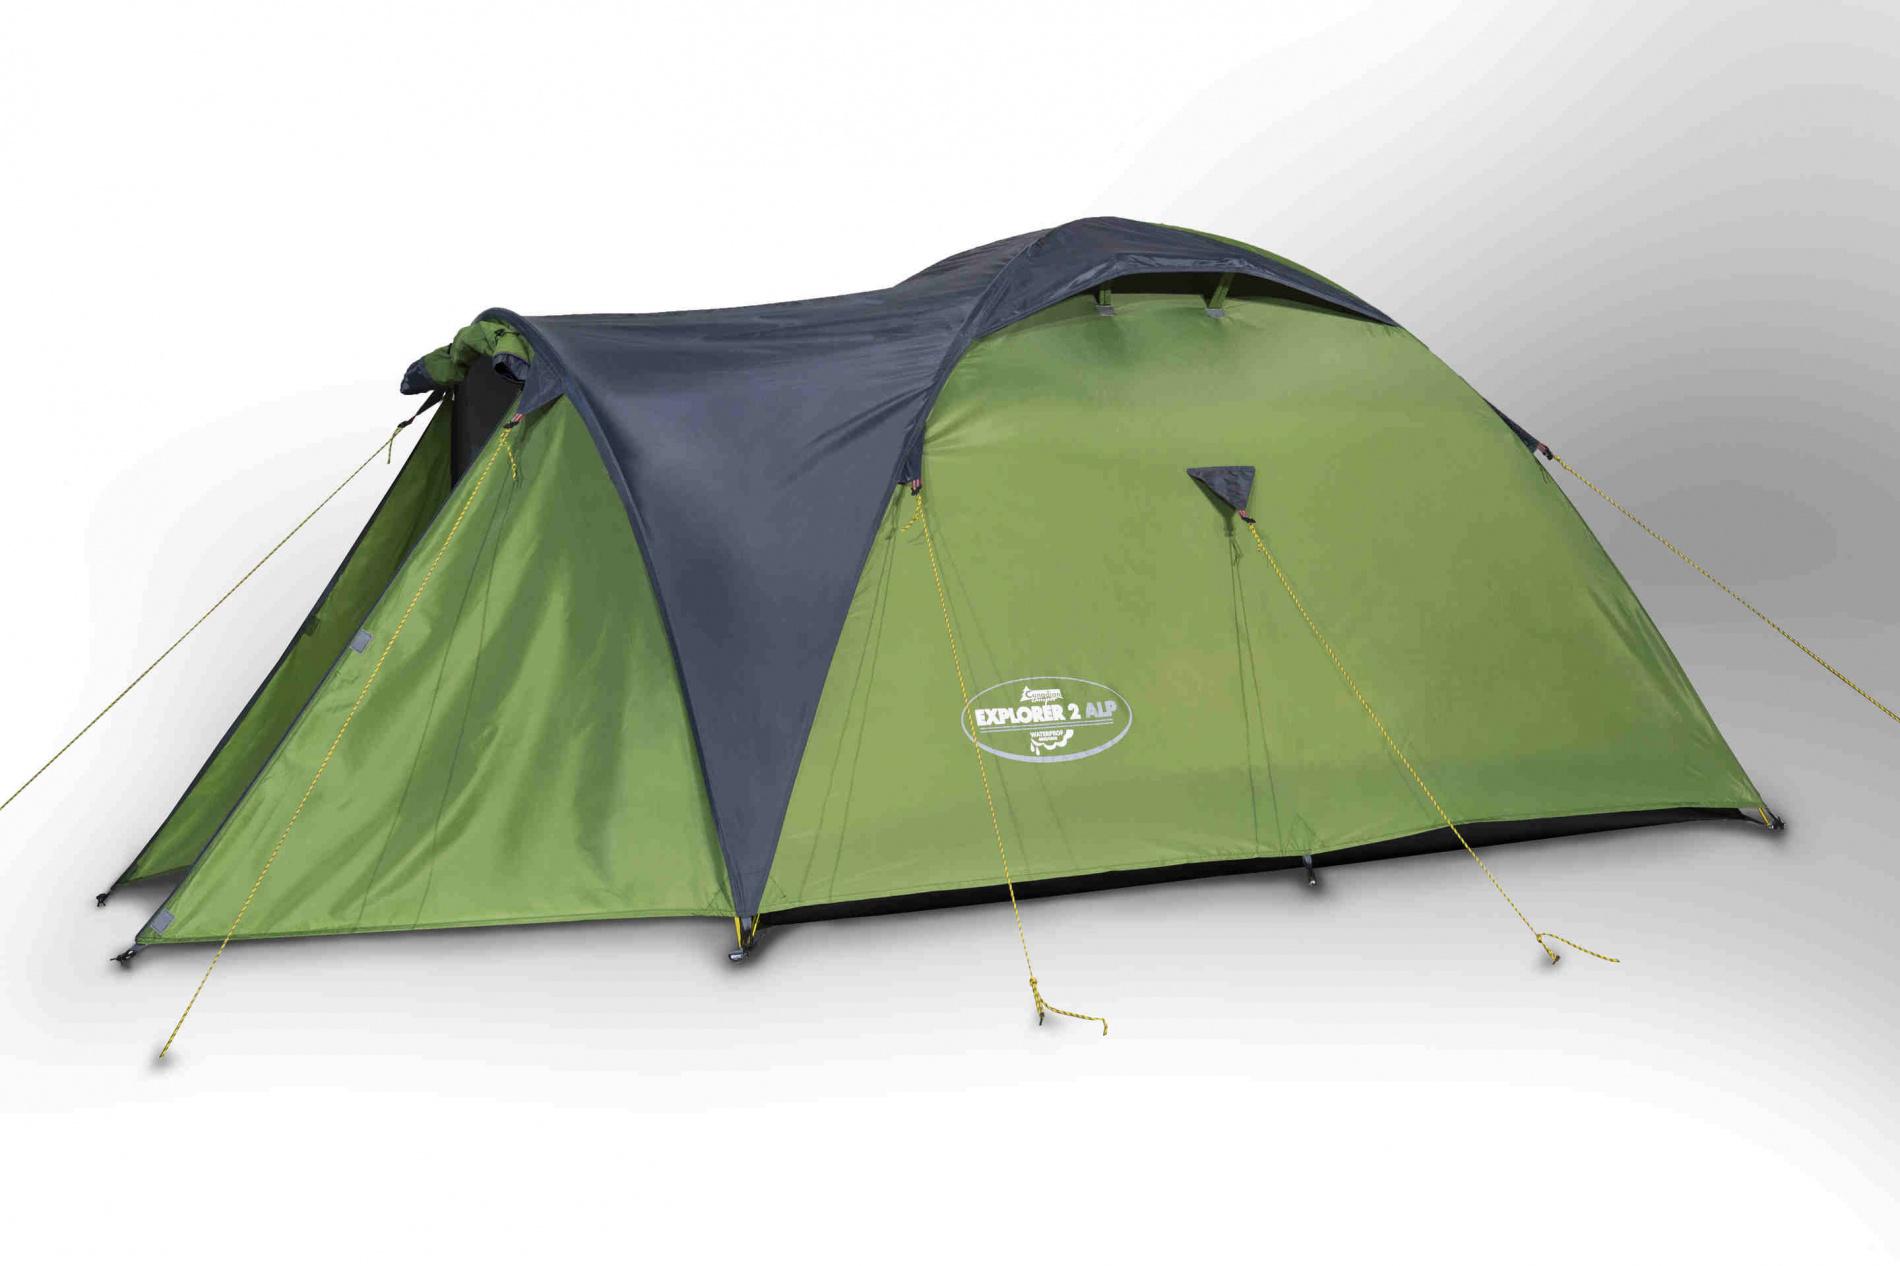 Палатка Canadian Camper EXPLORER 2 AL (цвет green) canadian camper cyclone 3 alu green